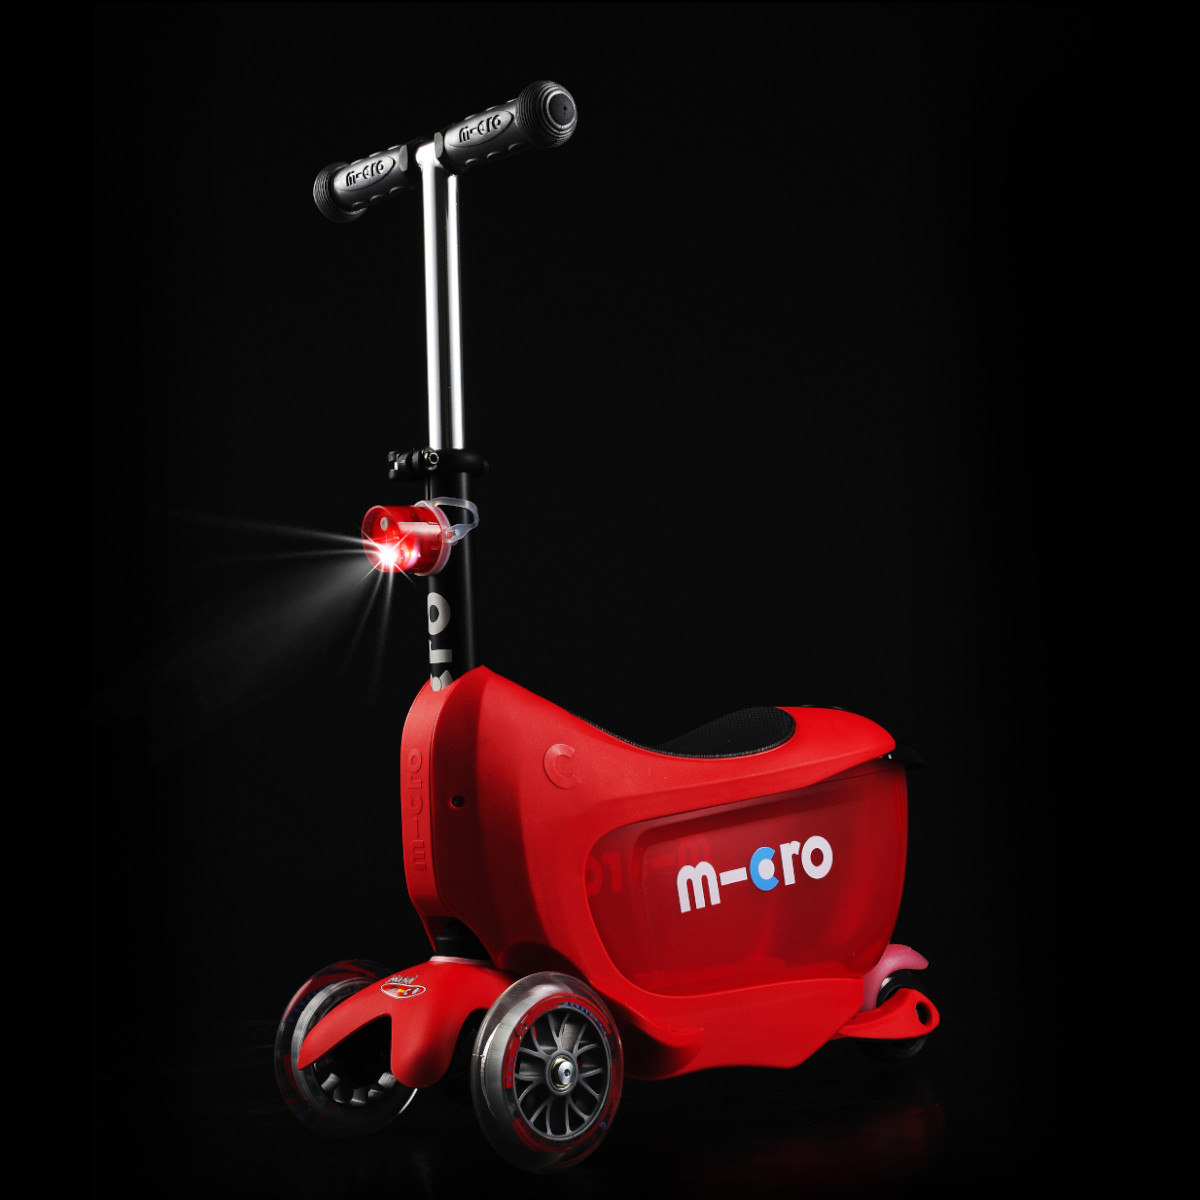 Micro Mini2go Deluxe Plus Red - 08